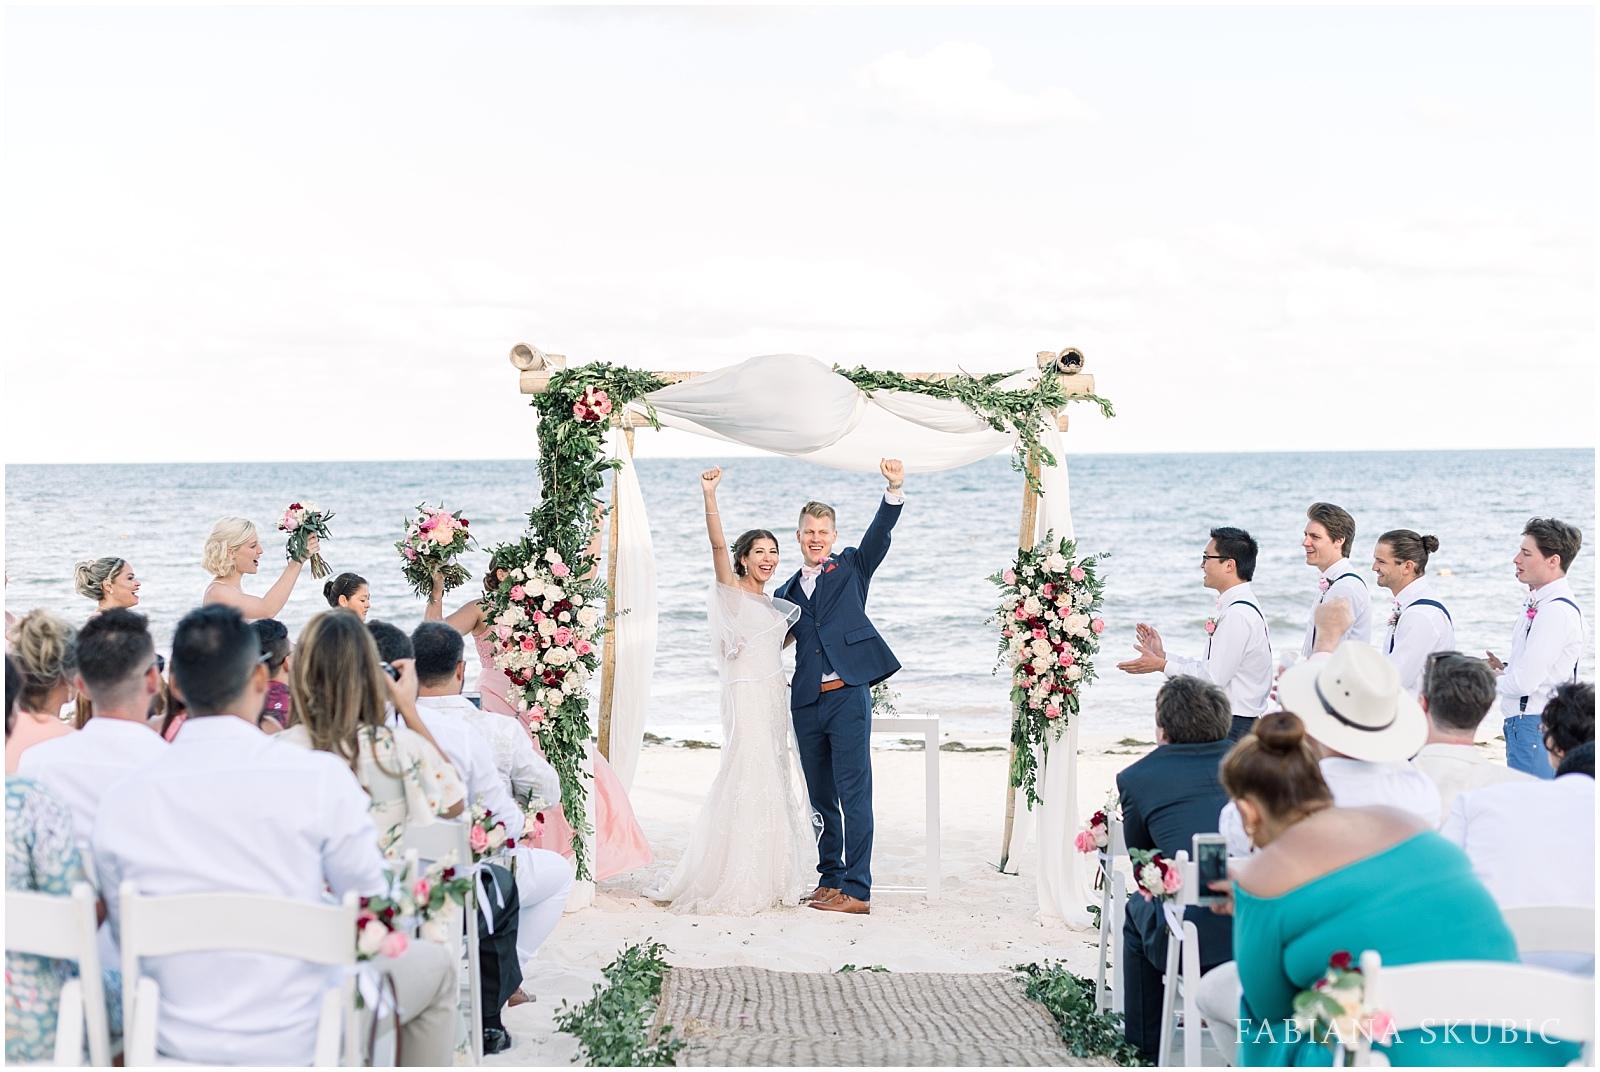 TJ_Now_Sapphire_Riviera_Cancun_Mexico_Wedding_Photos_0238.jpg